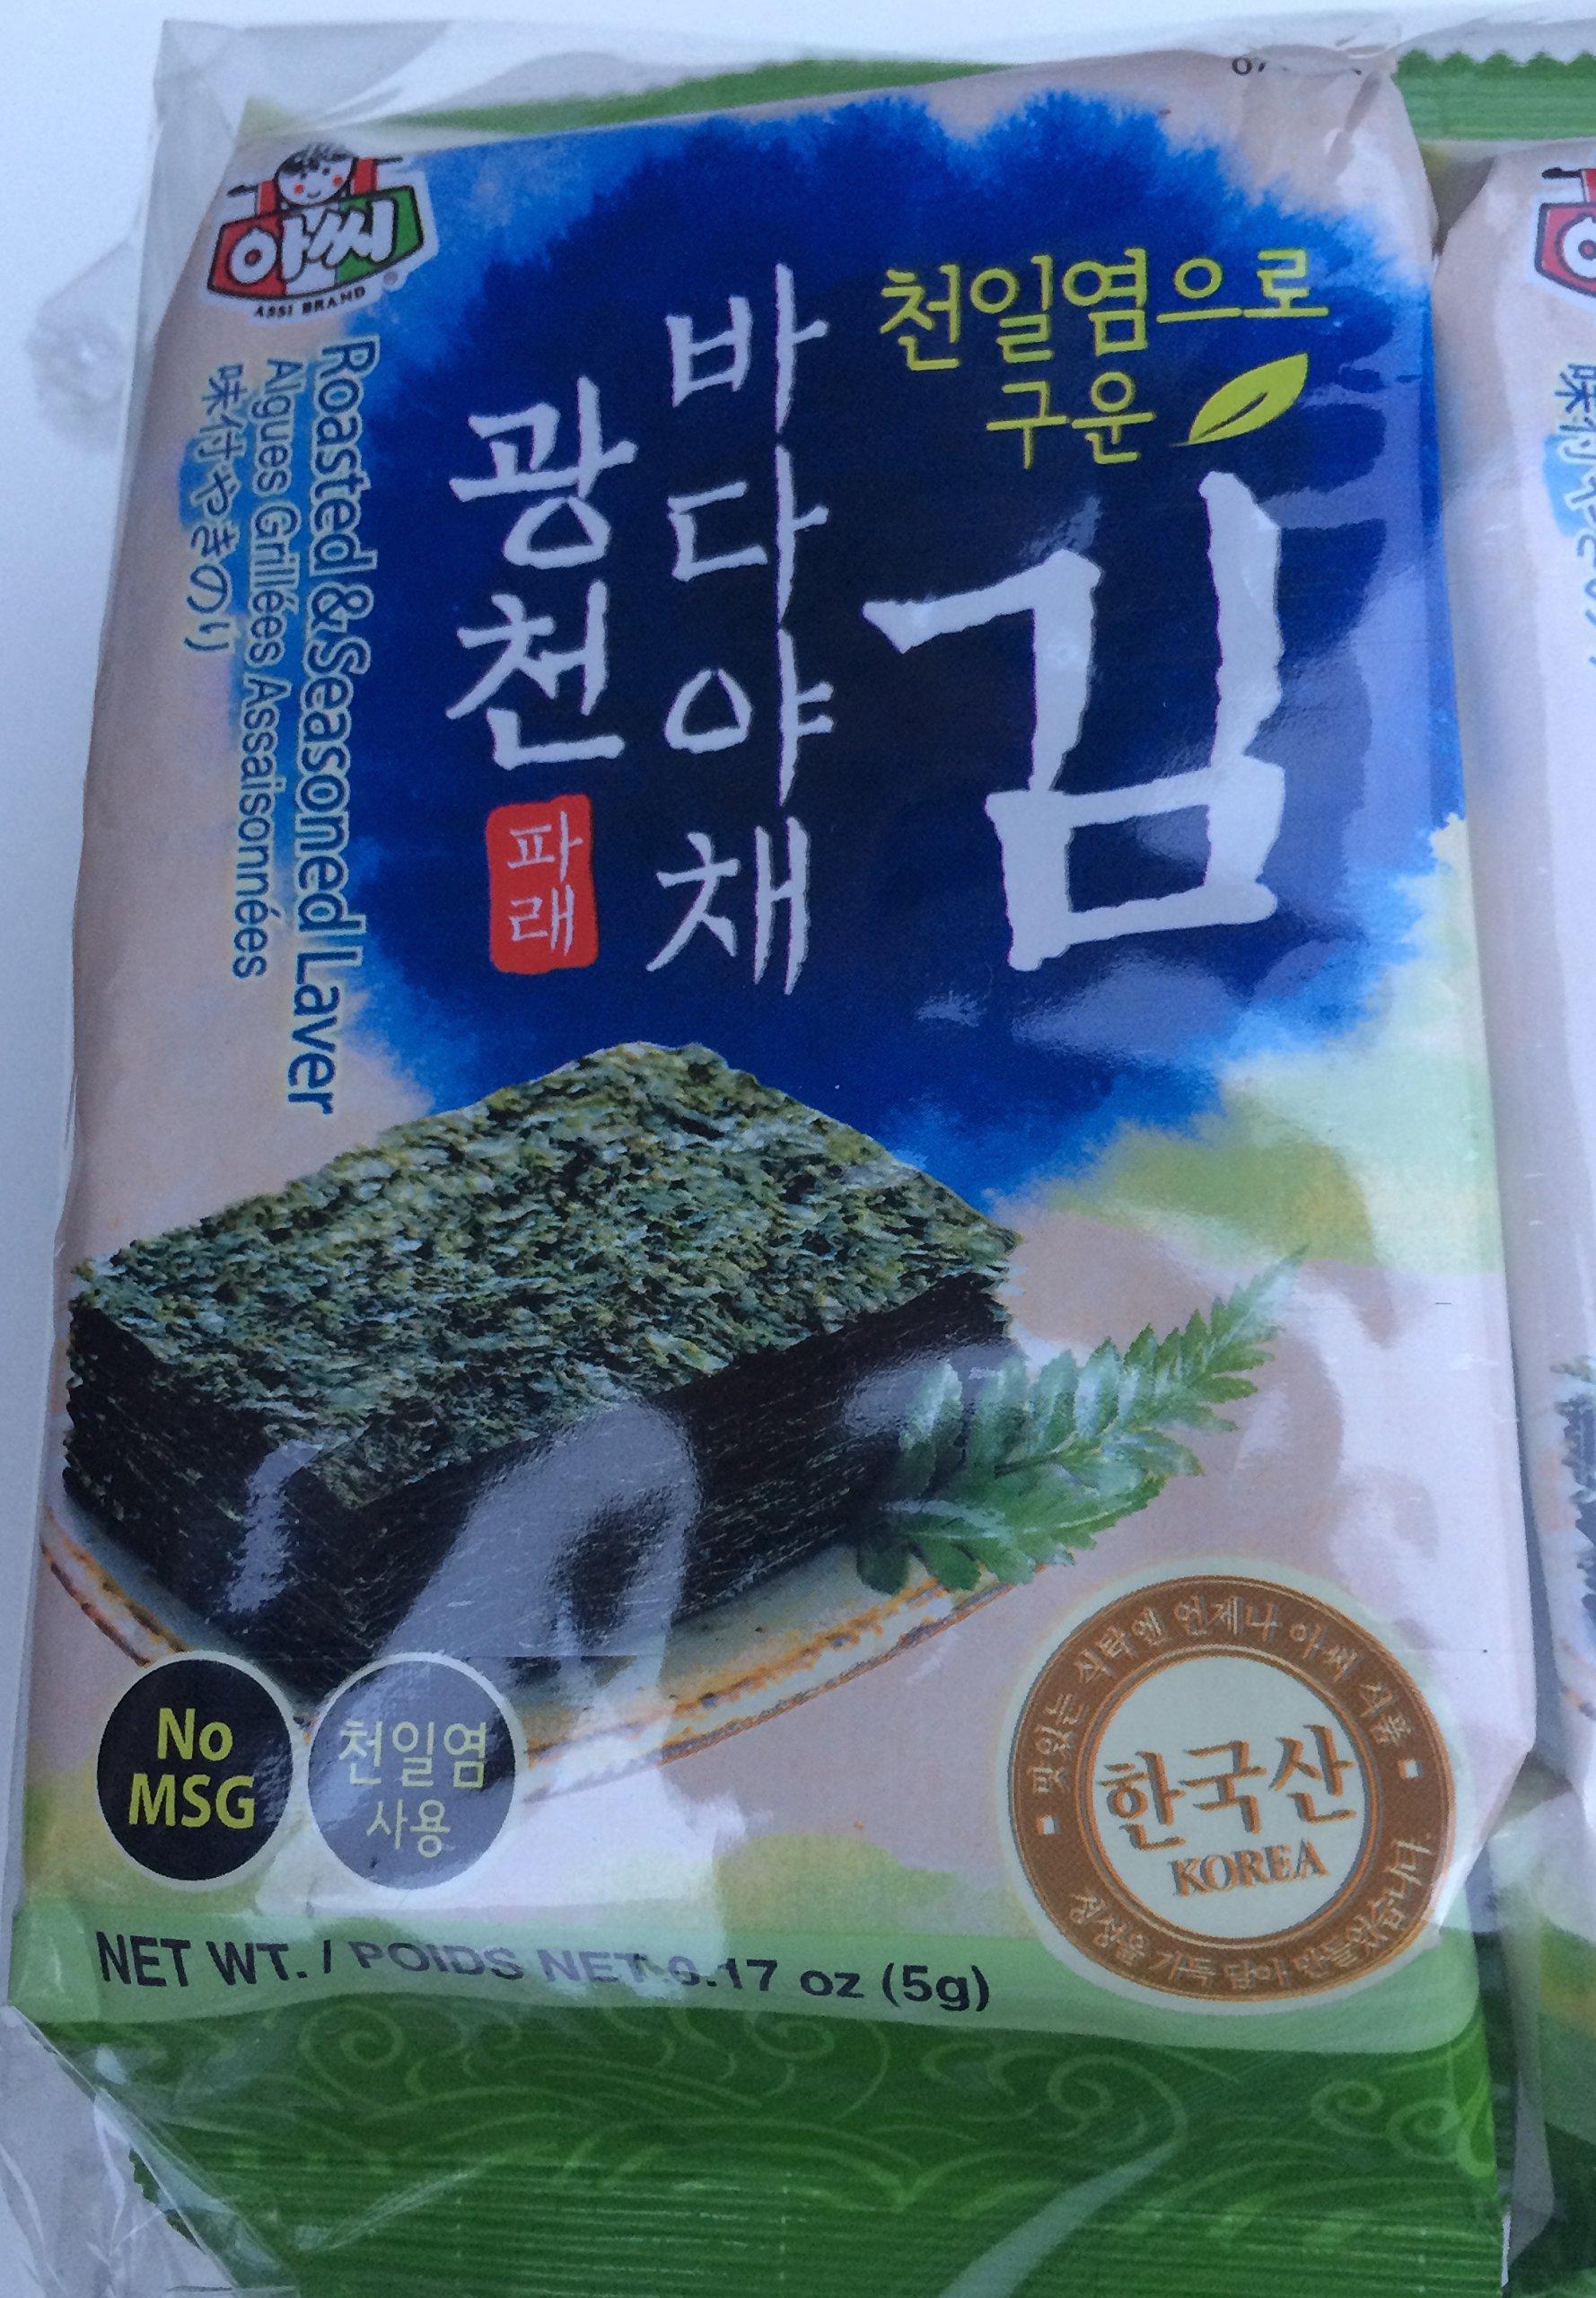 Roasted & Seasoned Seaweed (Laver) 0.17 oz - Pack of 10